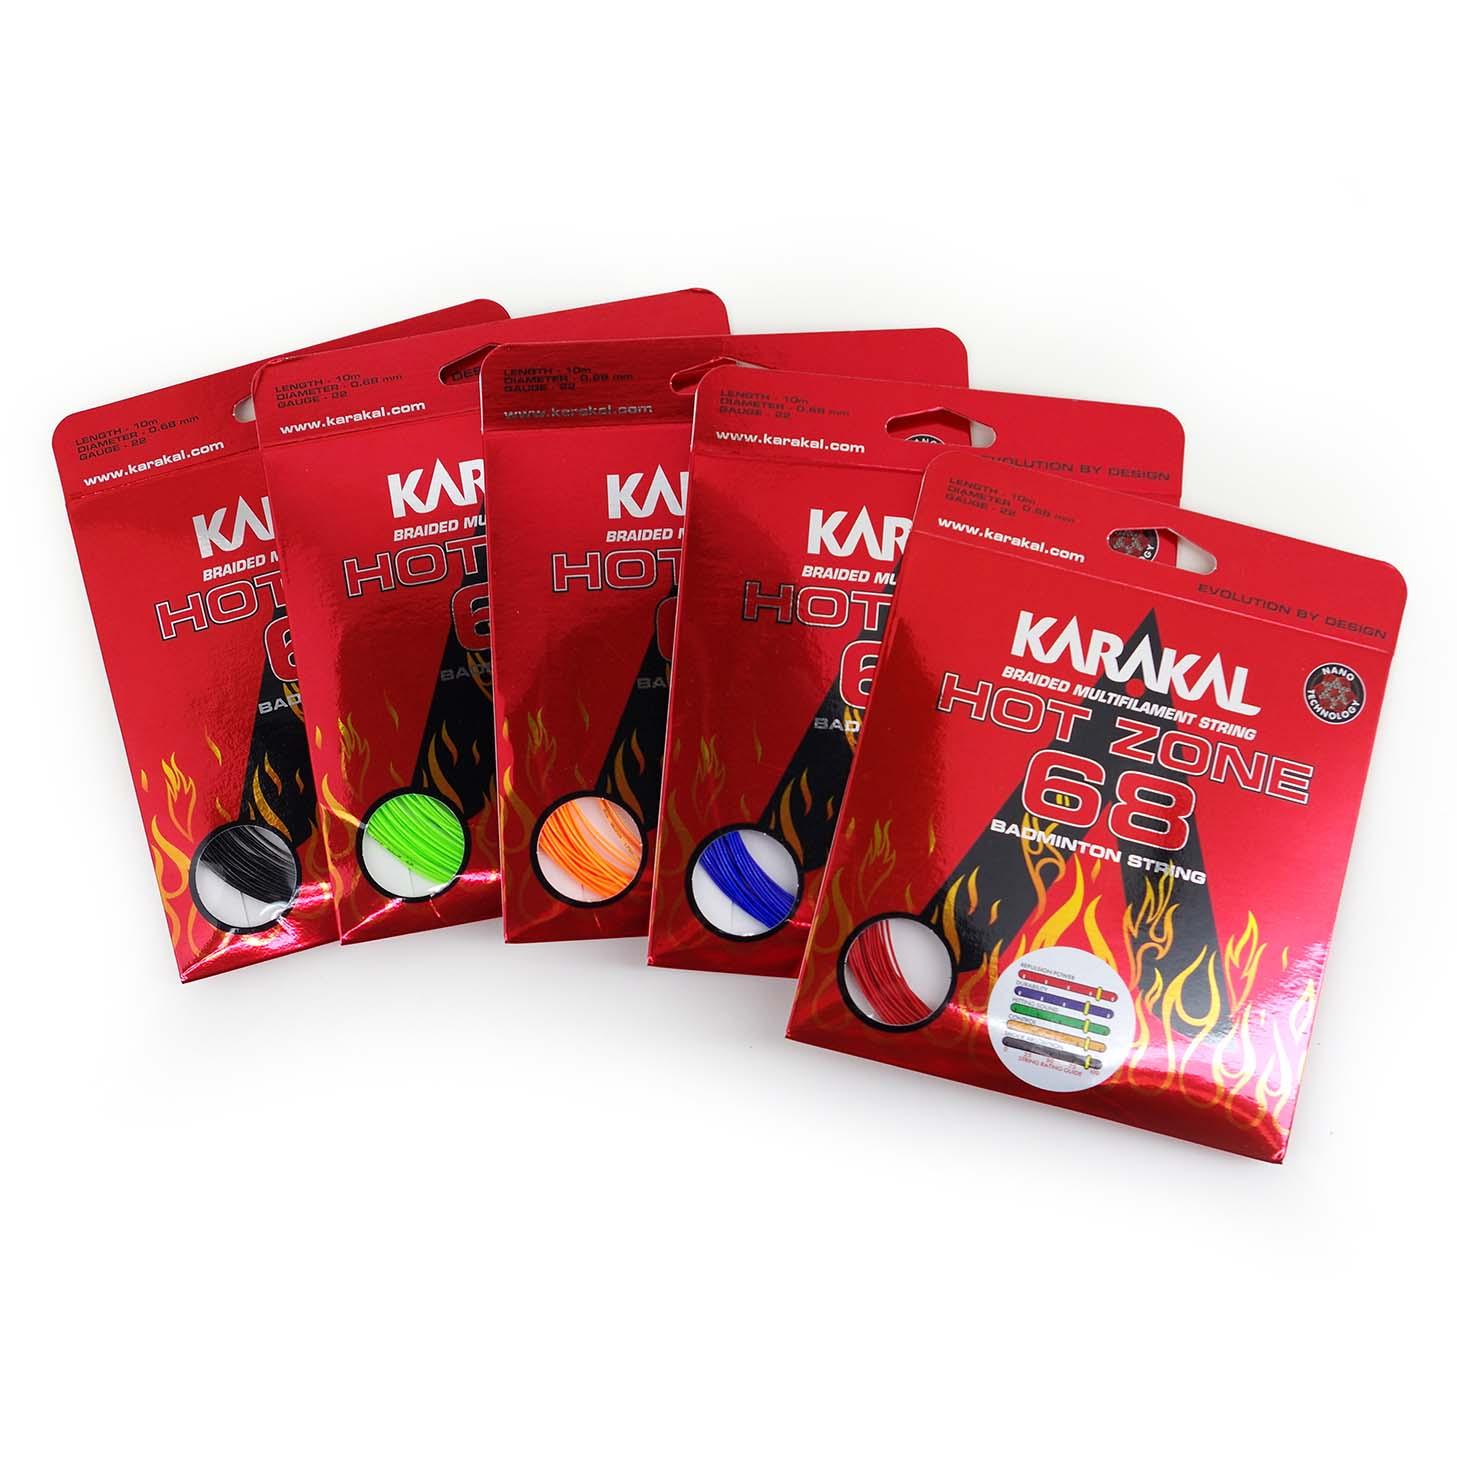 Karakal Hot Zone 68 Badminton Durable 0.68 Thin String Set